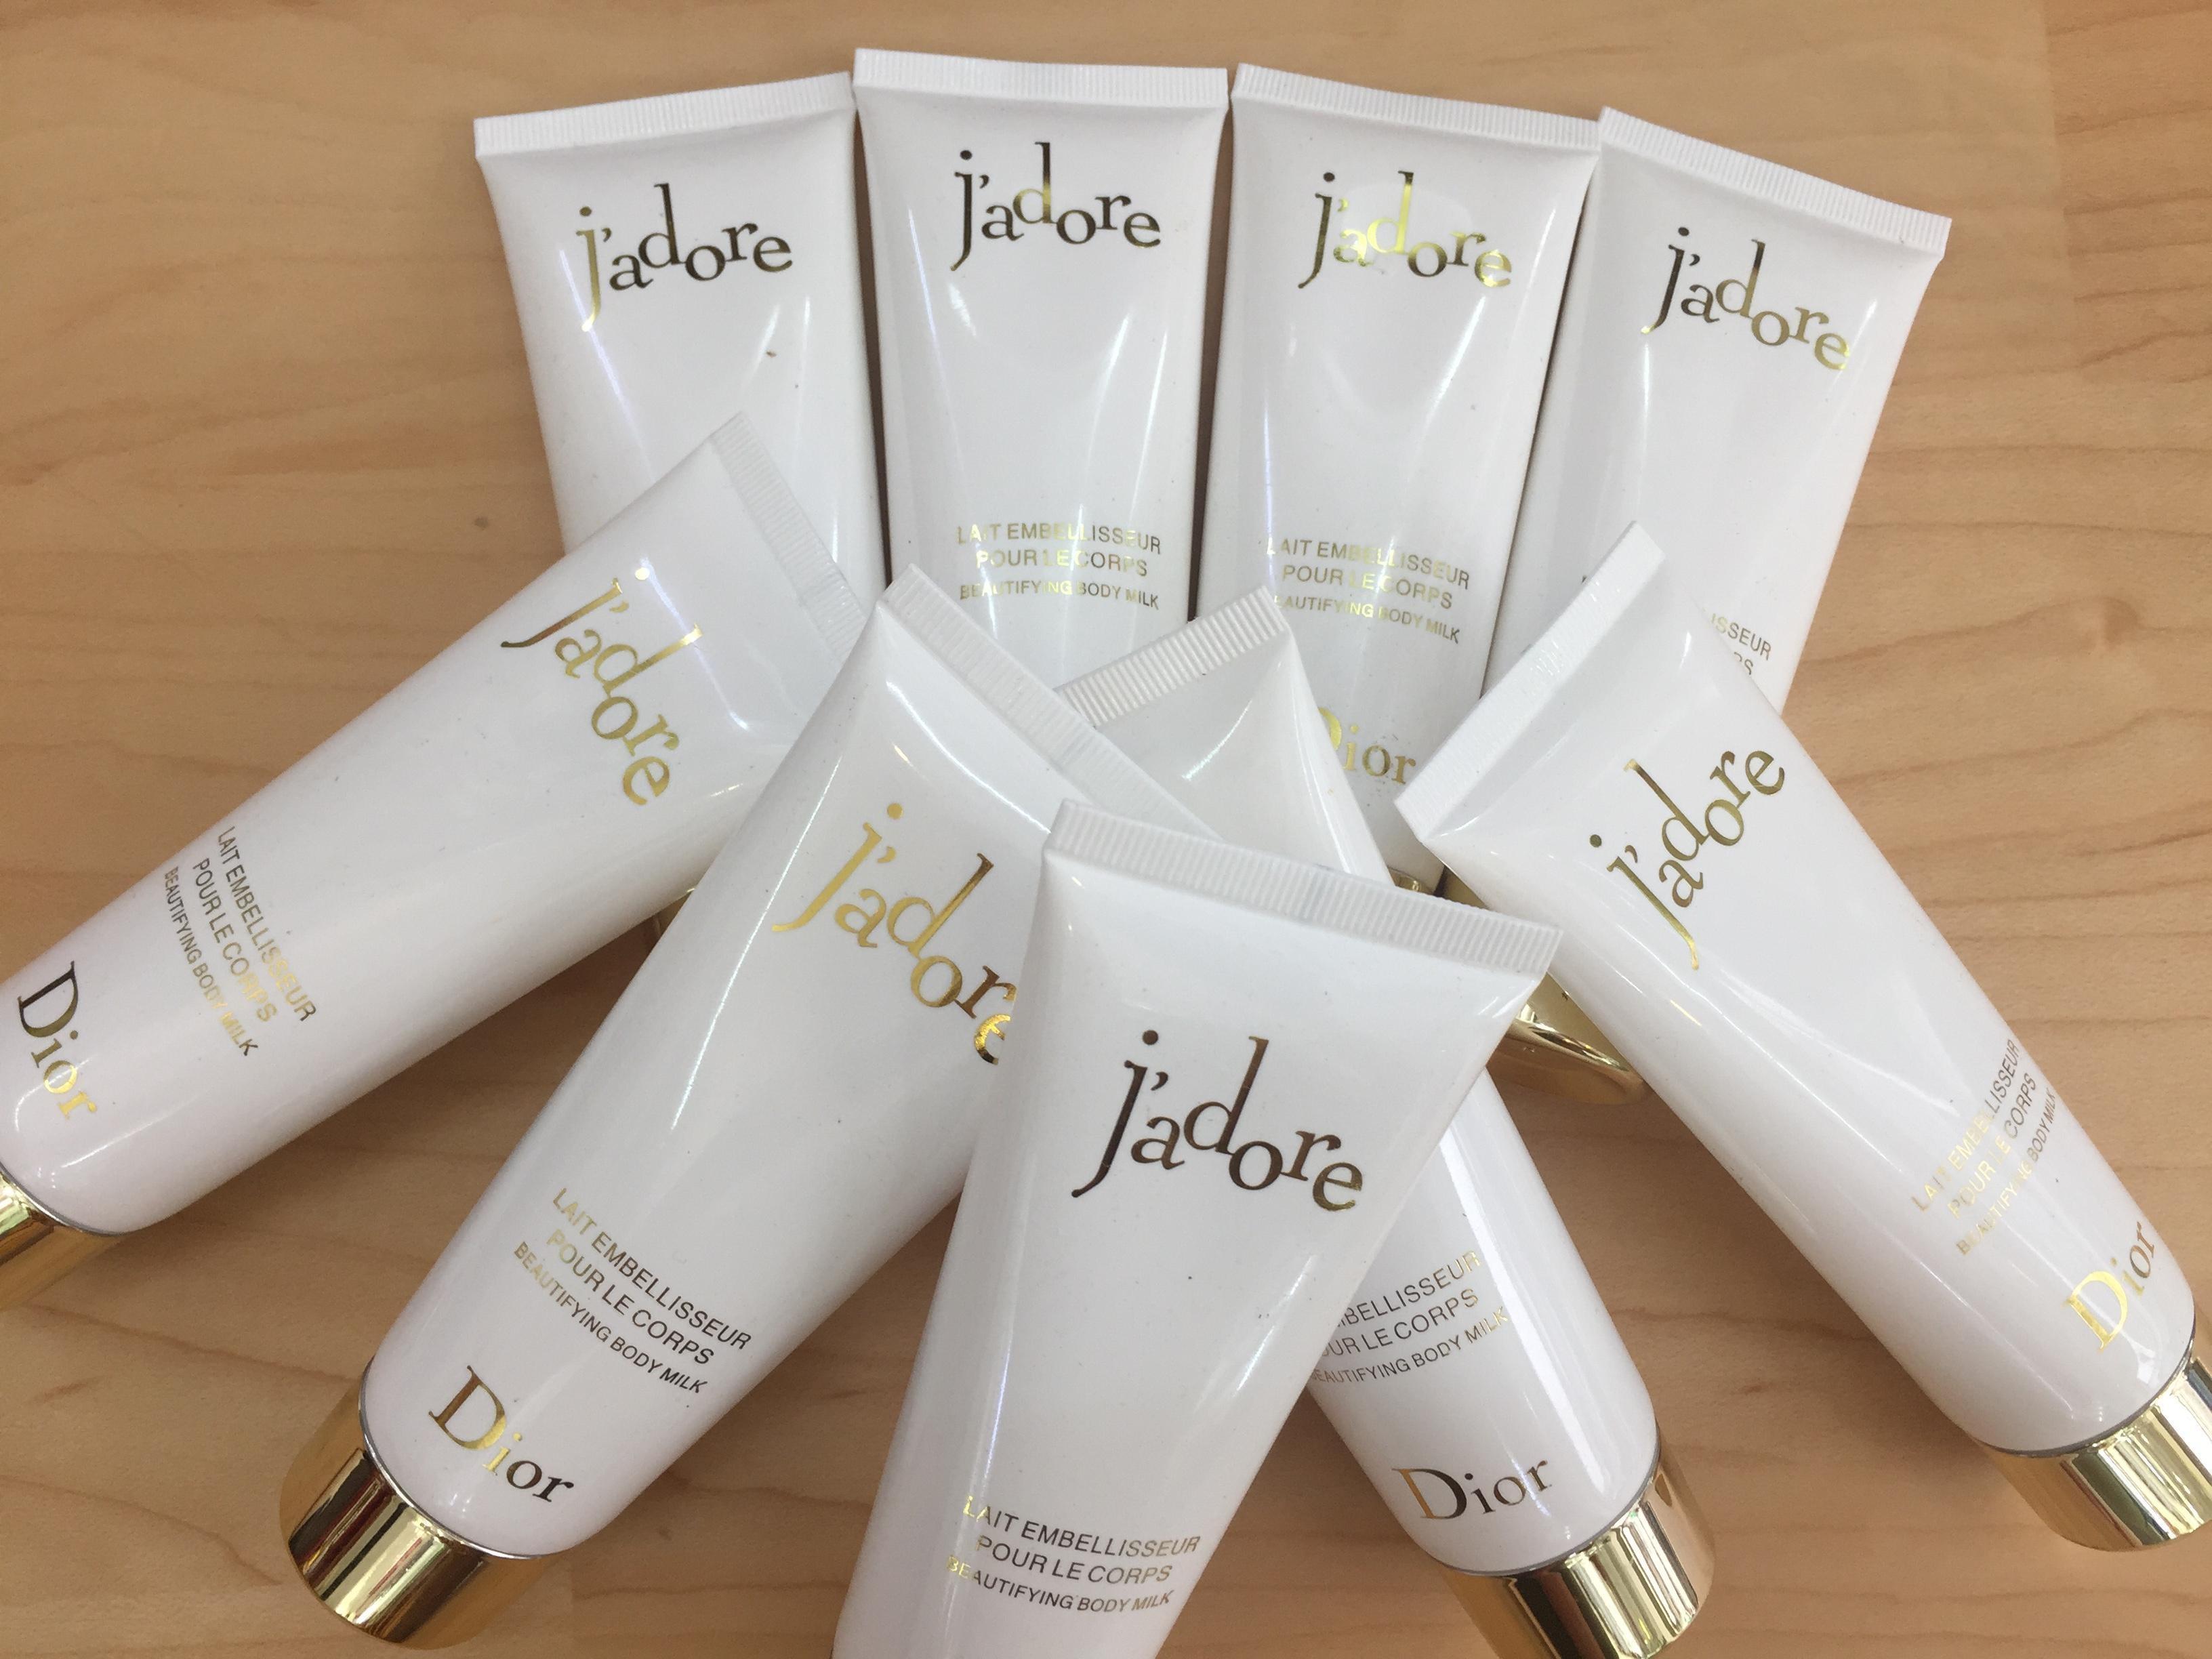 Sữa dưỡng thể Dior J'adore Beautifying Body Milk